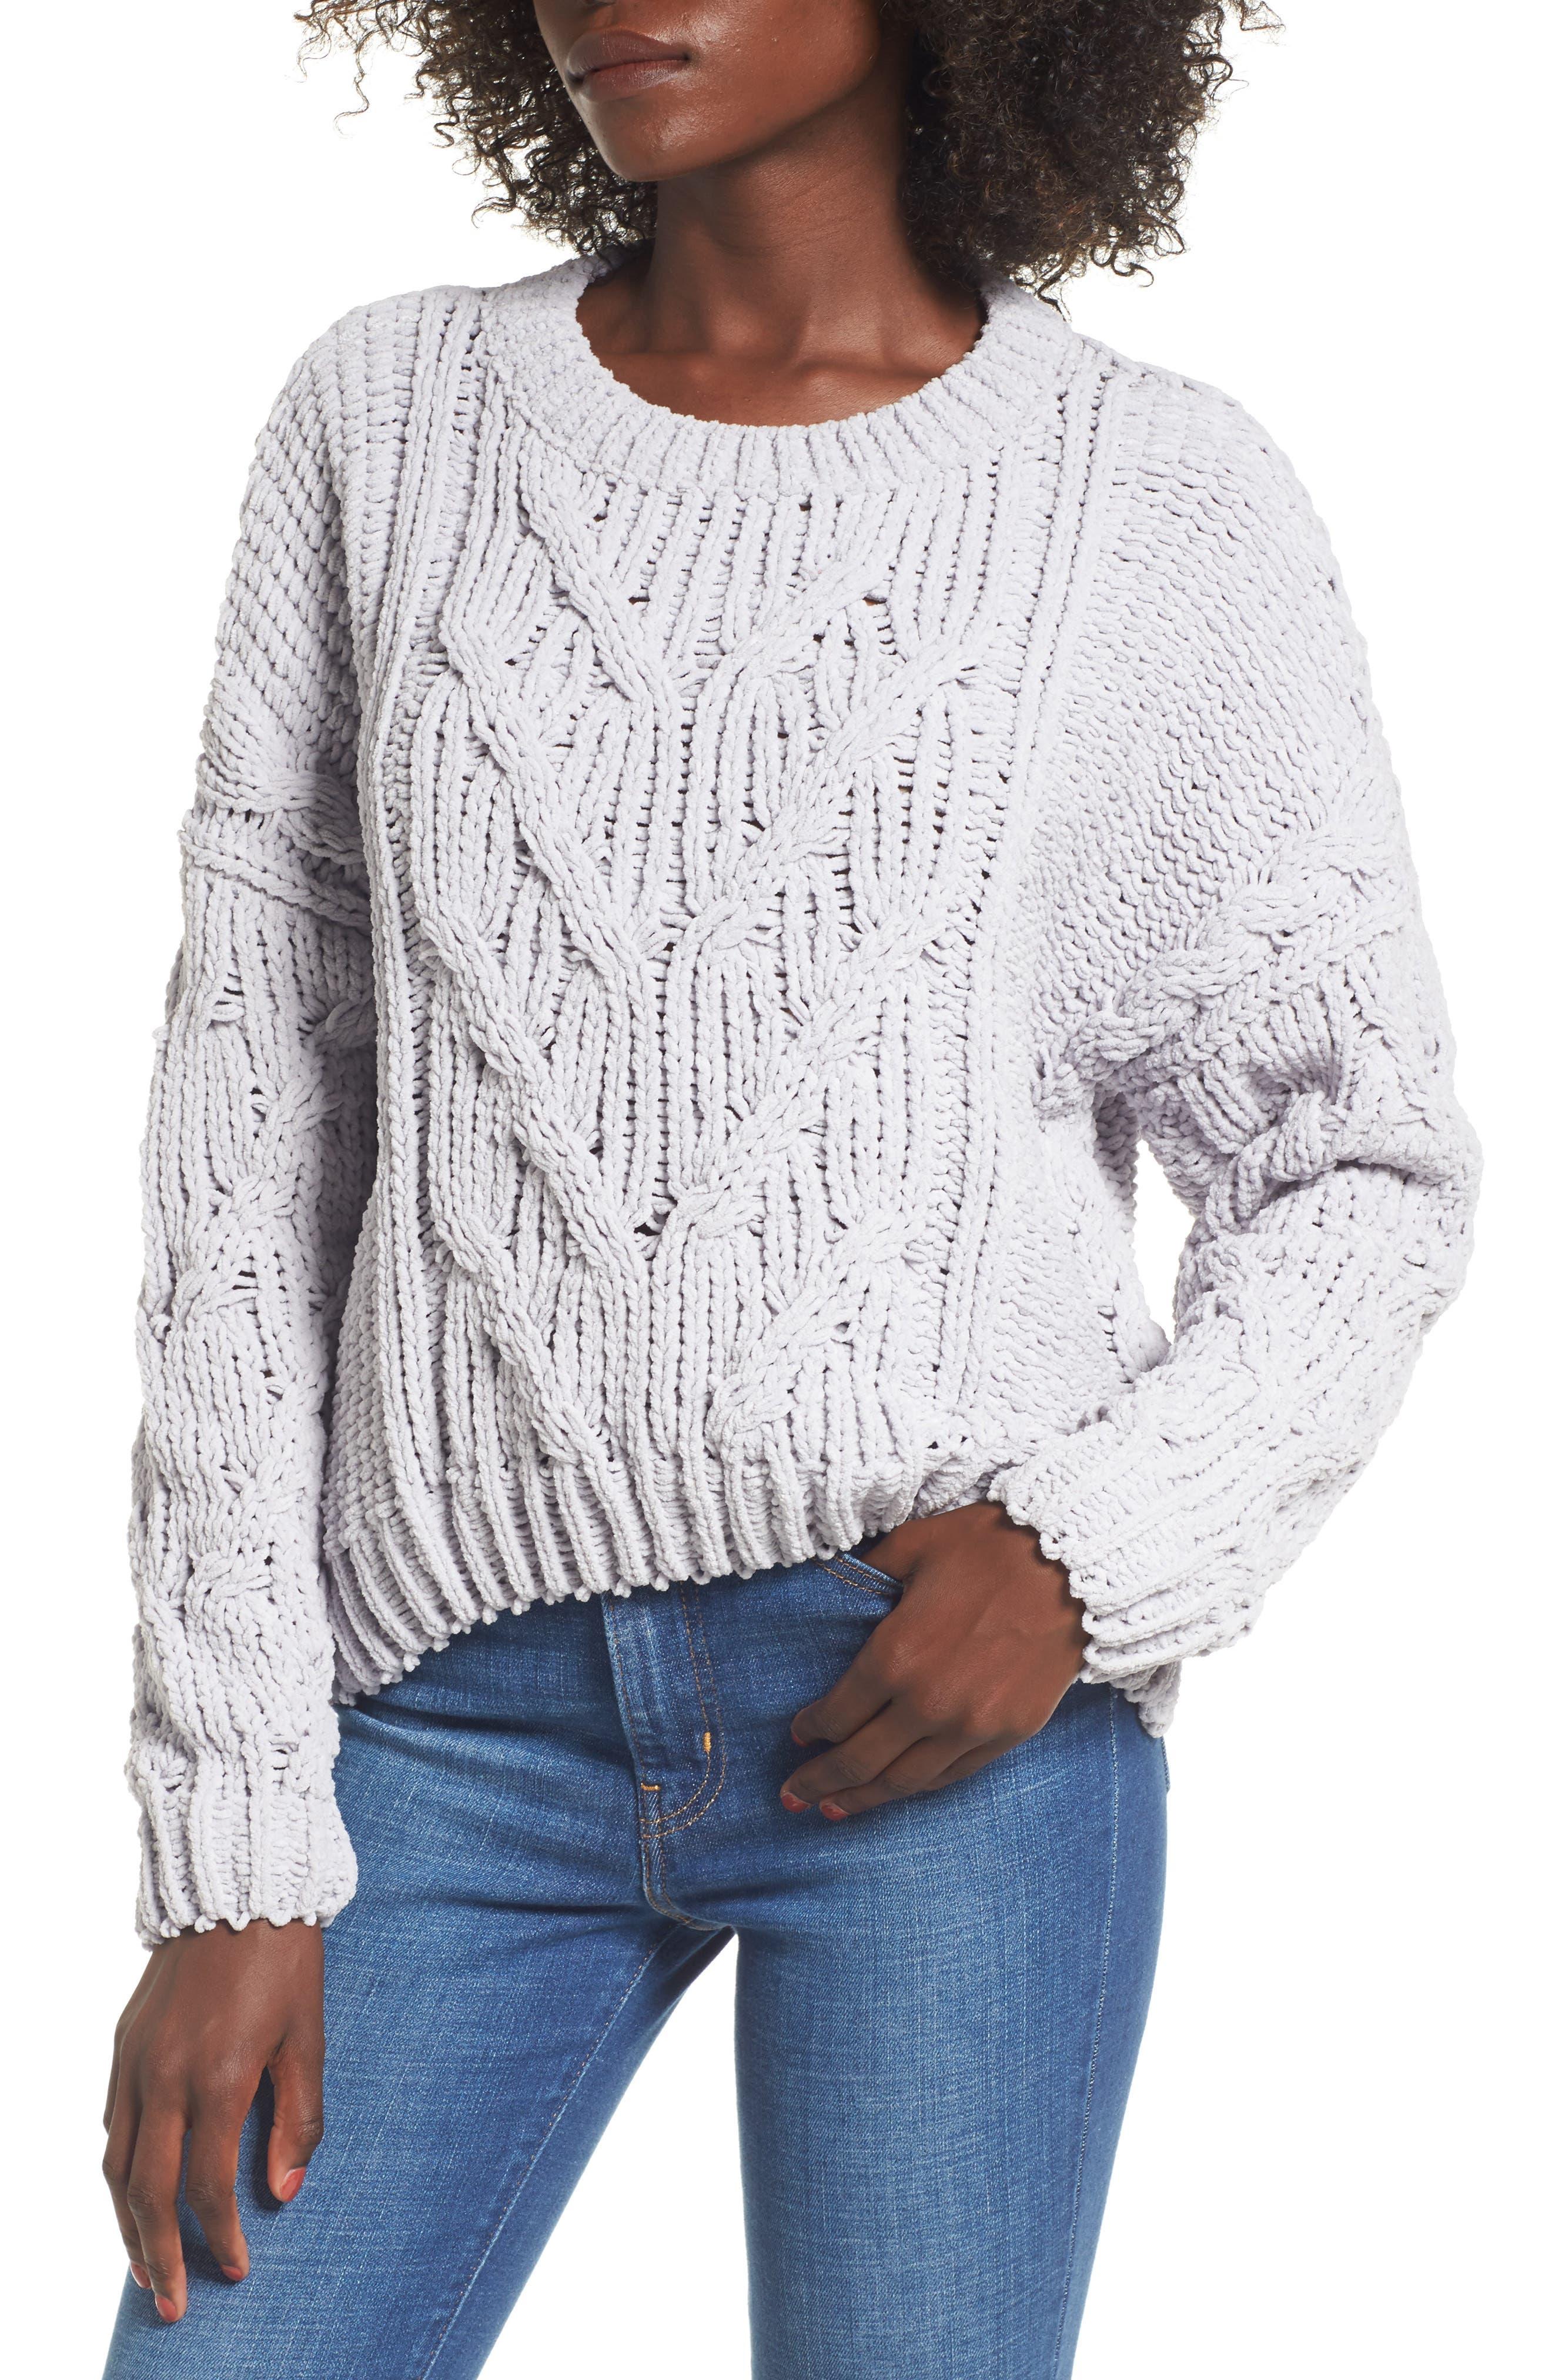 Alternate Image 1 Selected - J.O.A. Cozy Crewneck Sweater